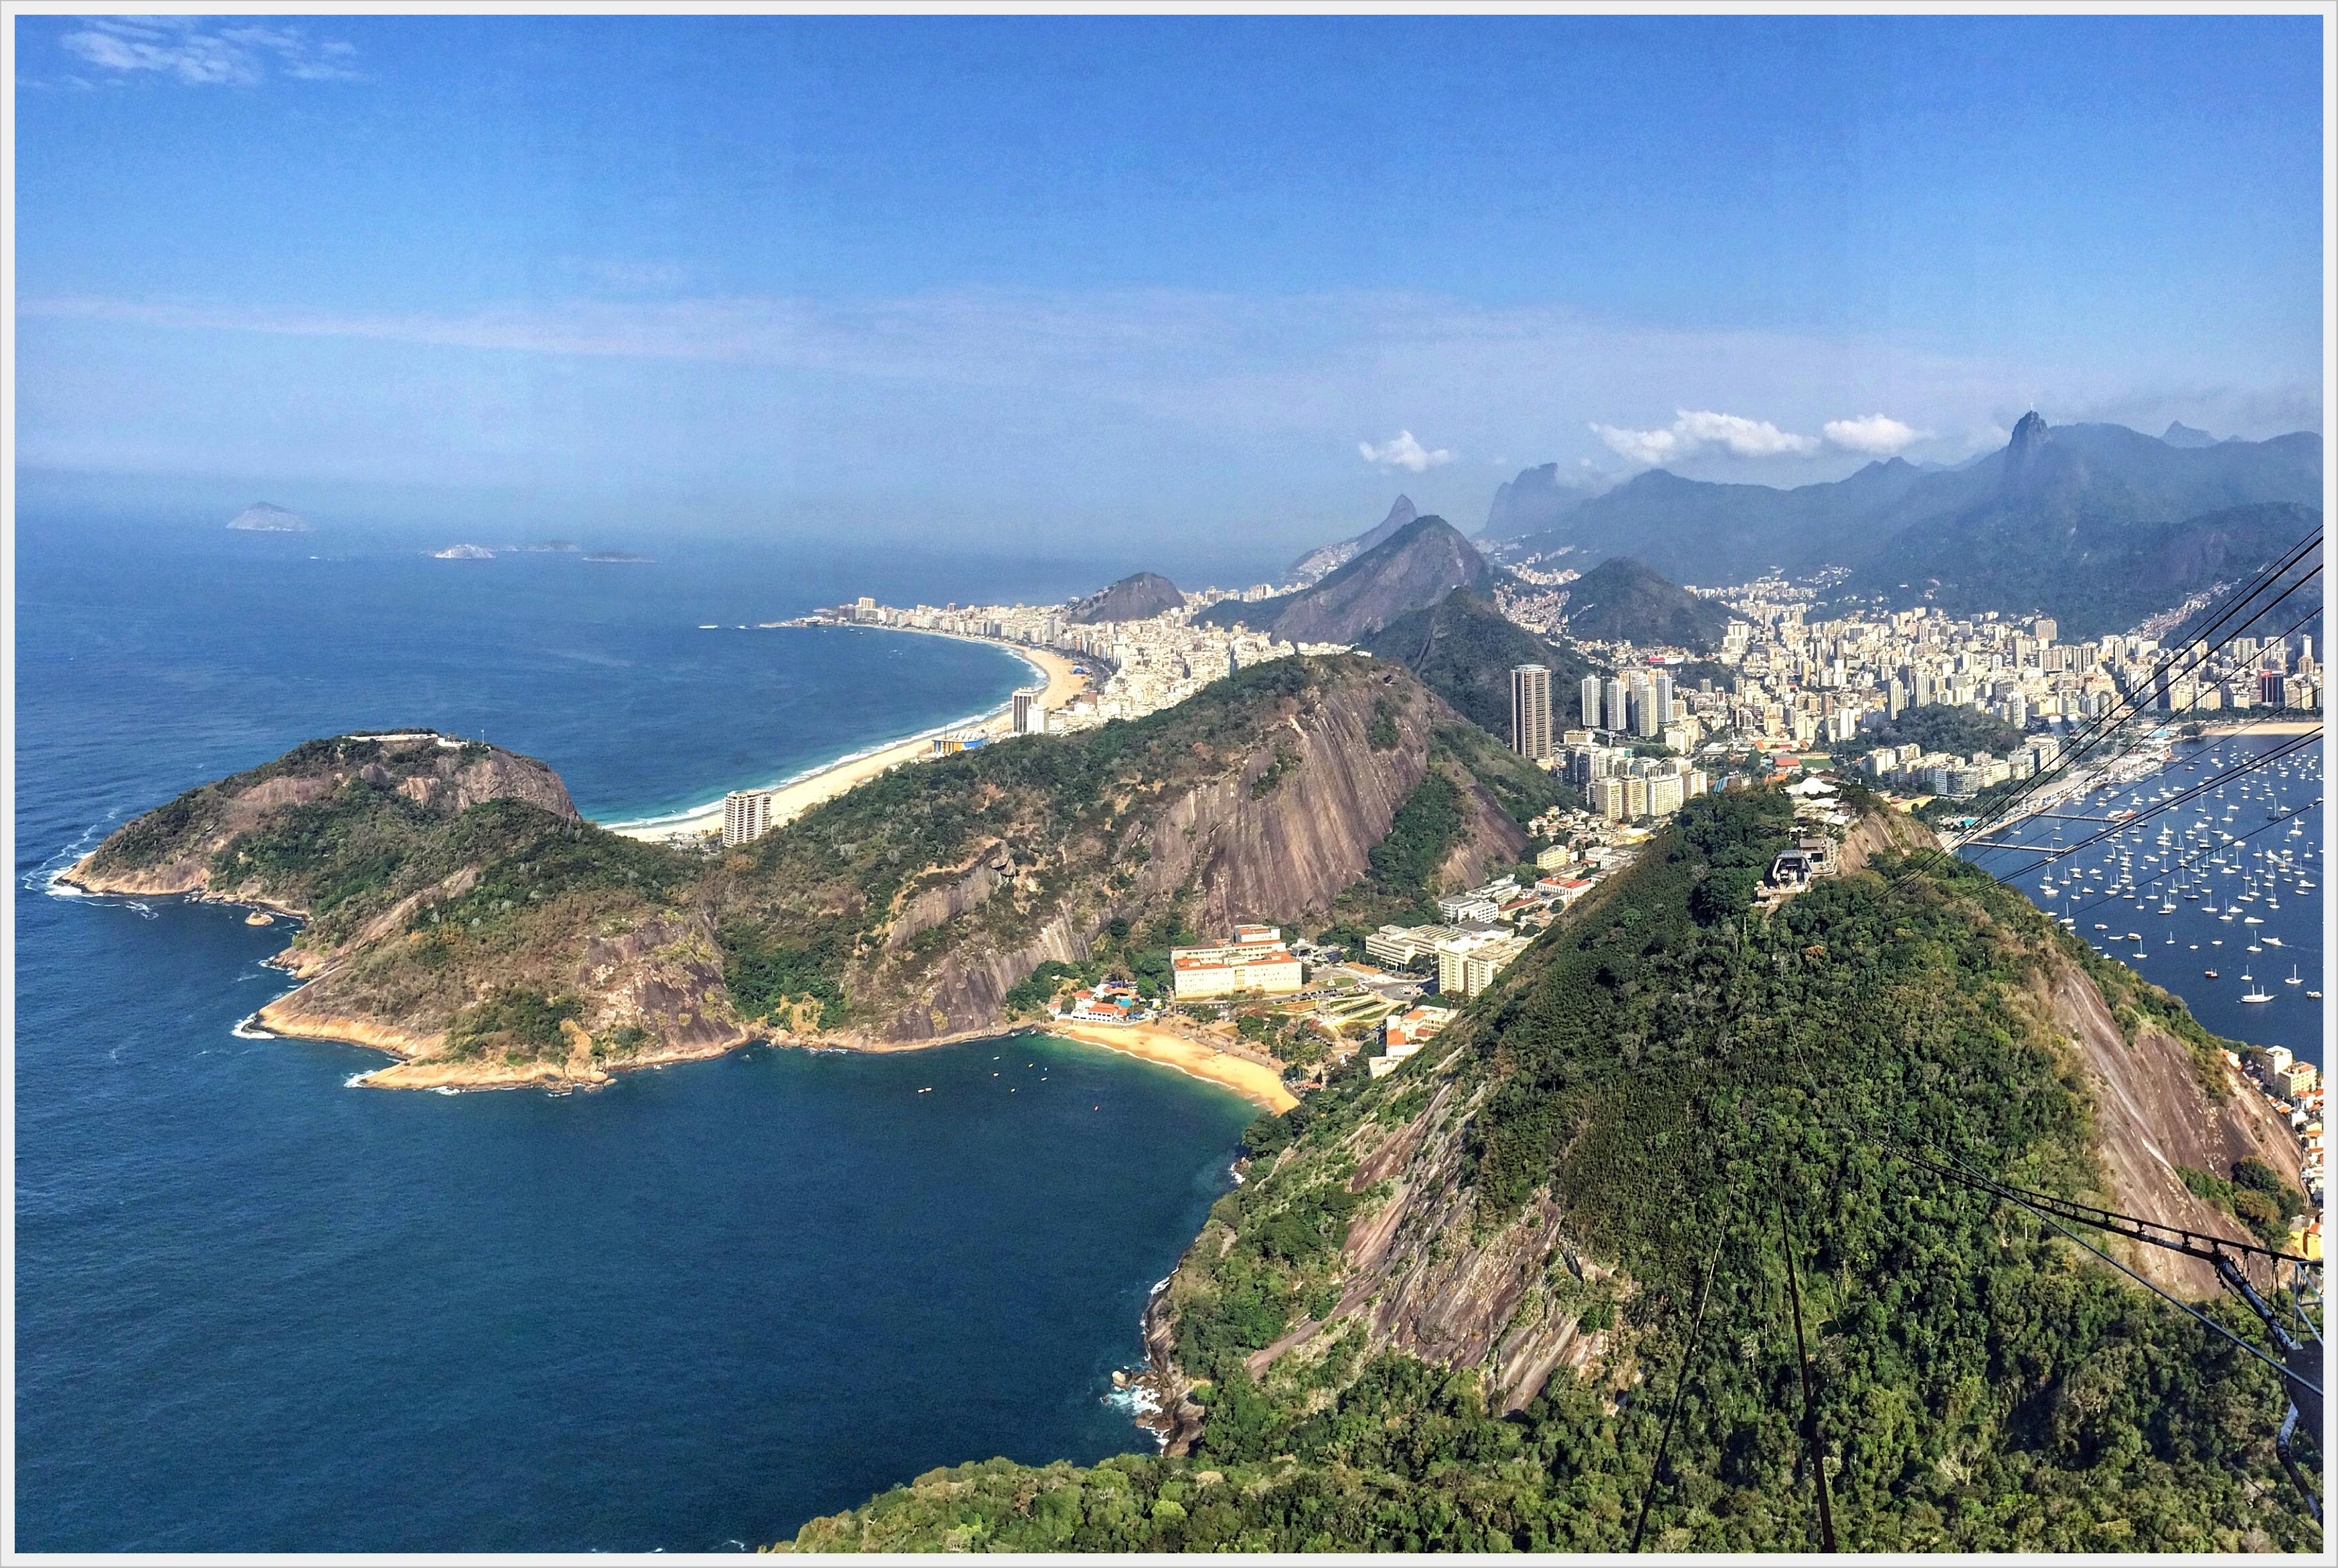 Rio de Janeiro, Brazil 2016